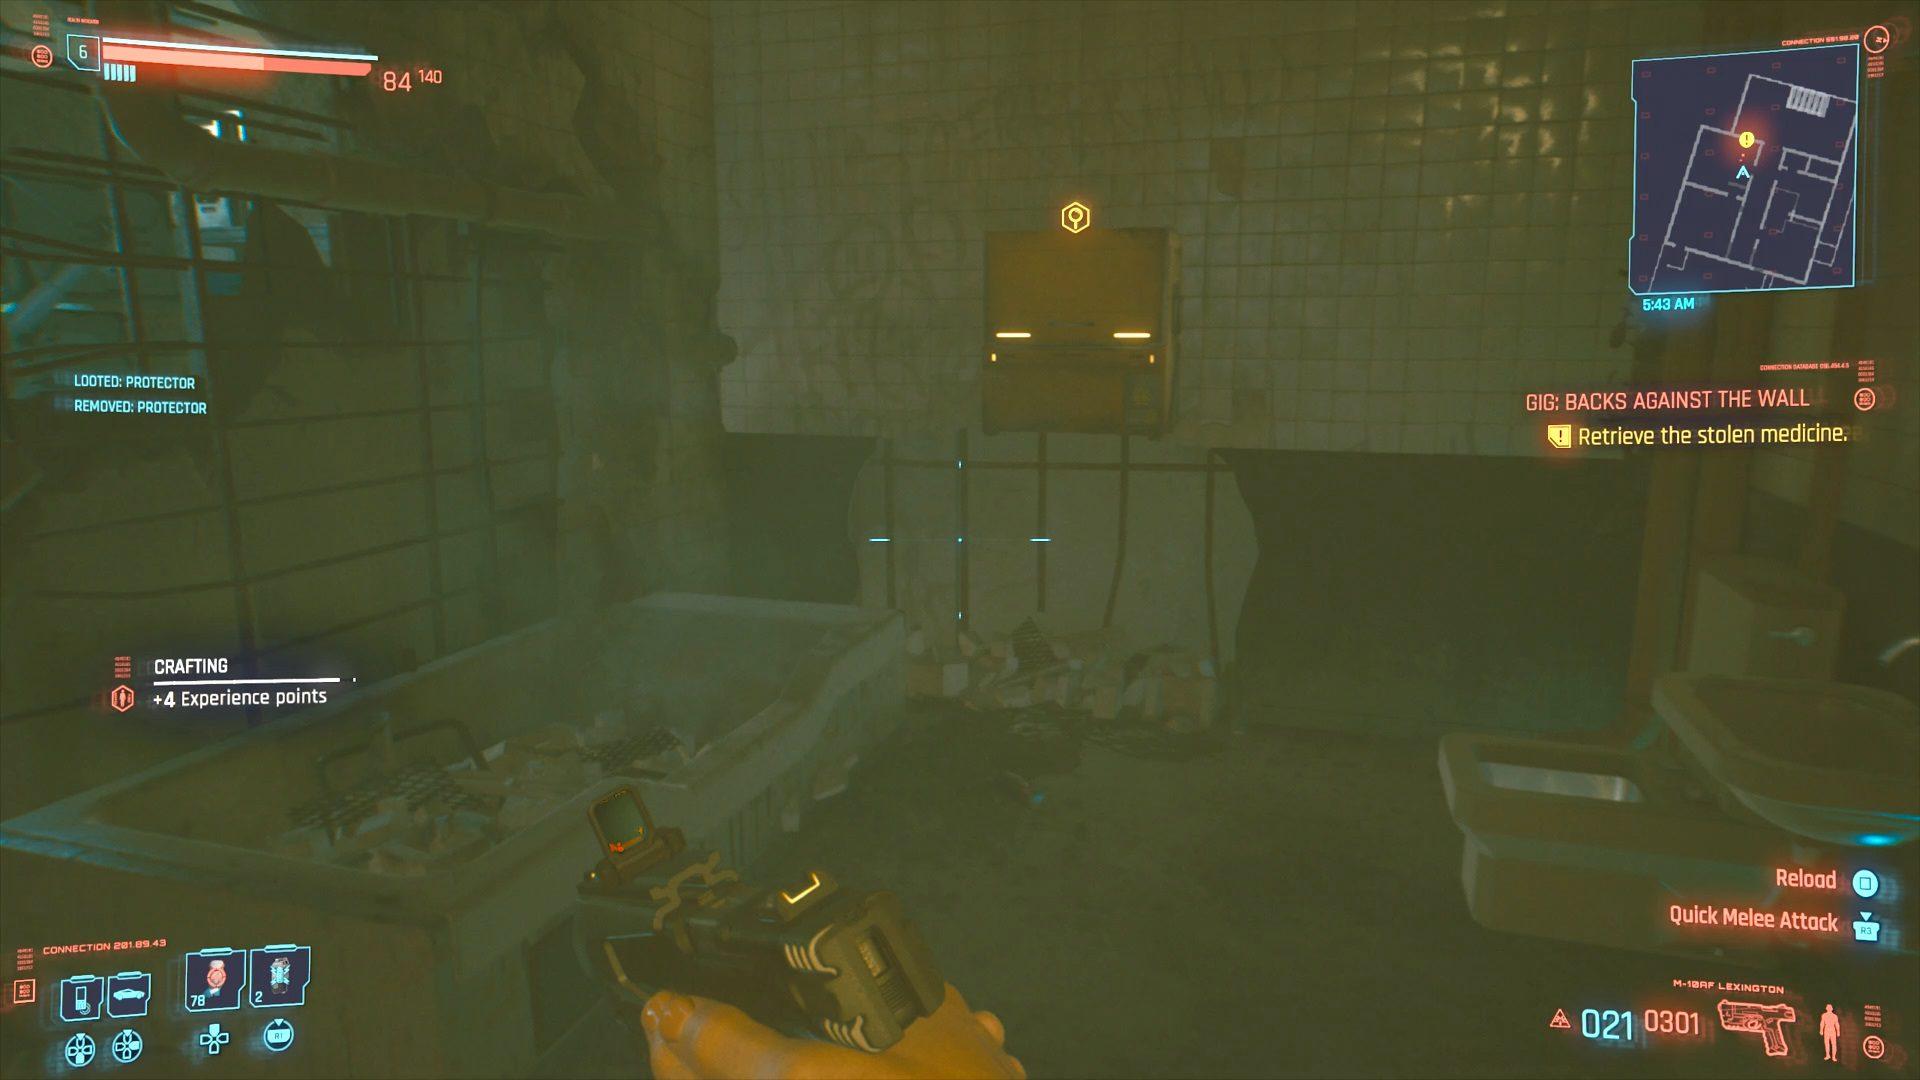 Cyberpunk 2077 Stolen Medicine Location